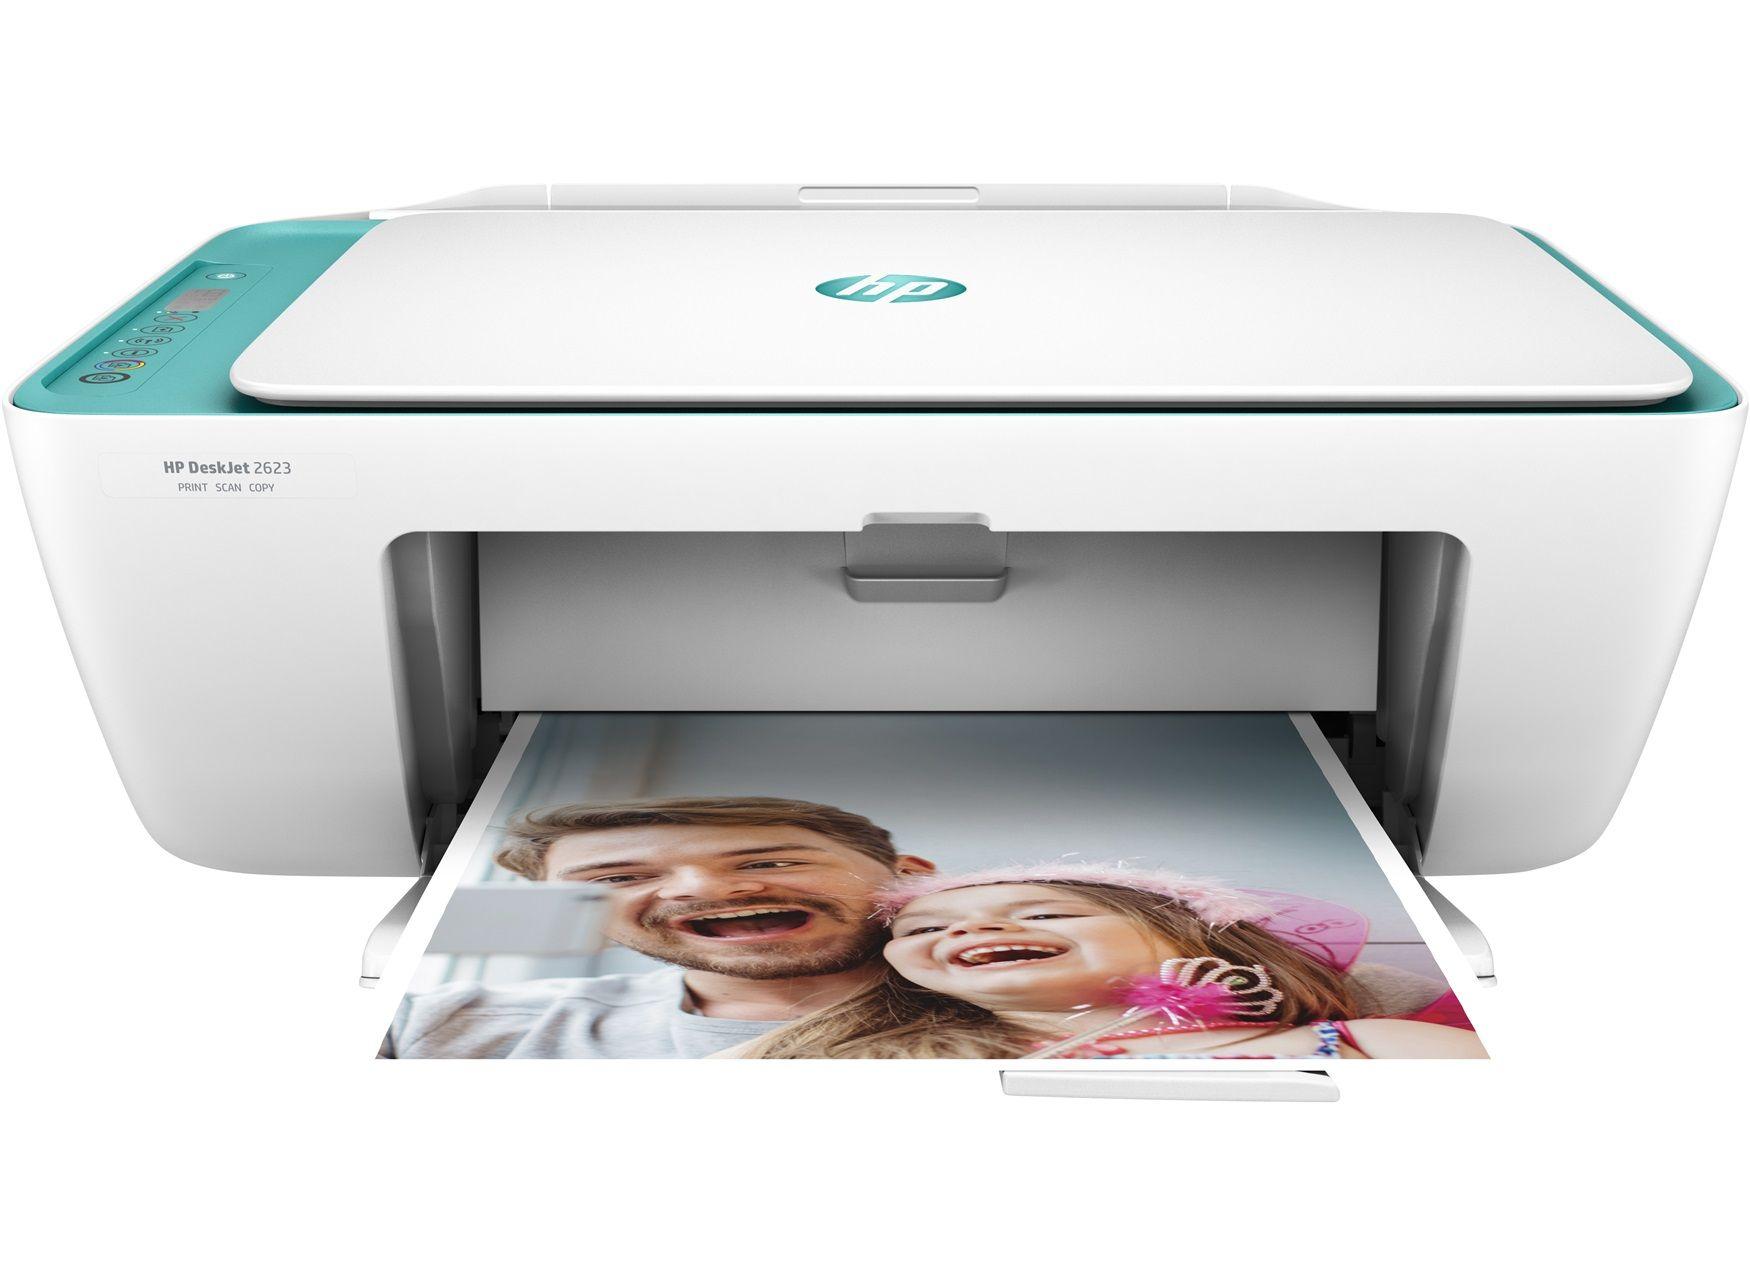 123 HP DeskJet 2623 Printer Setup | Wireless printer, Hp ...